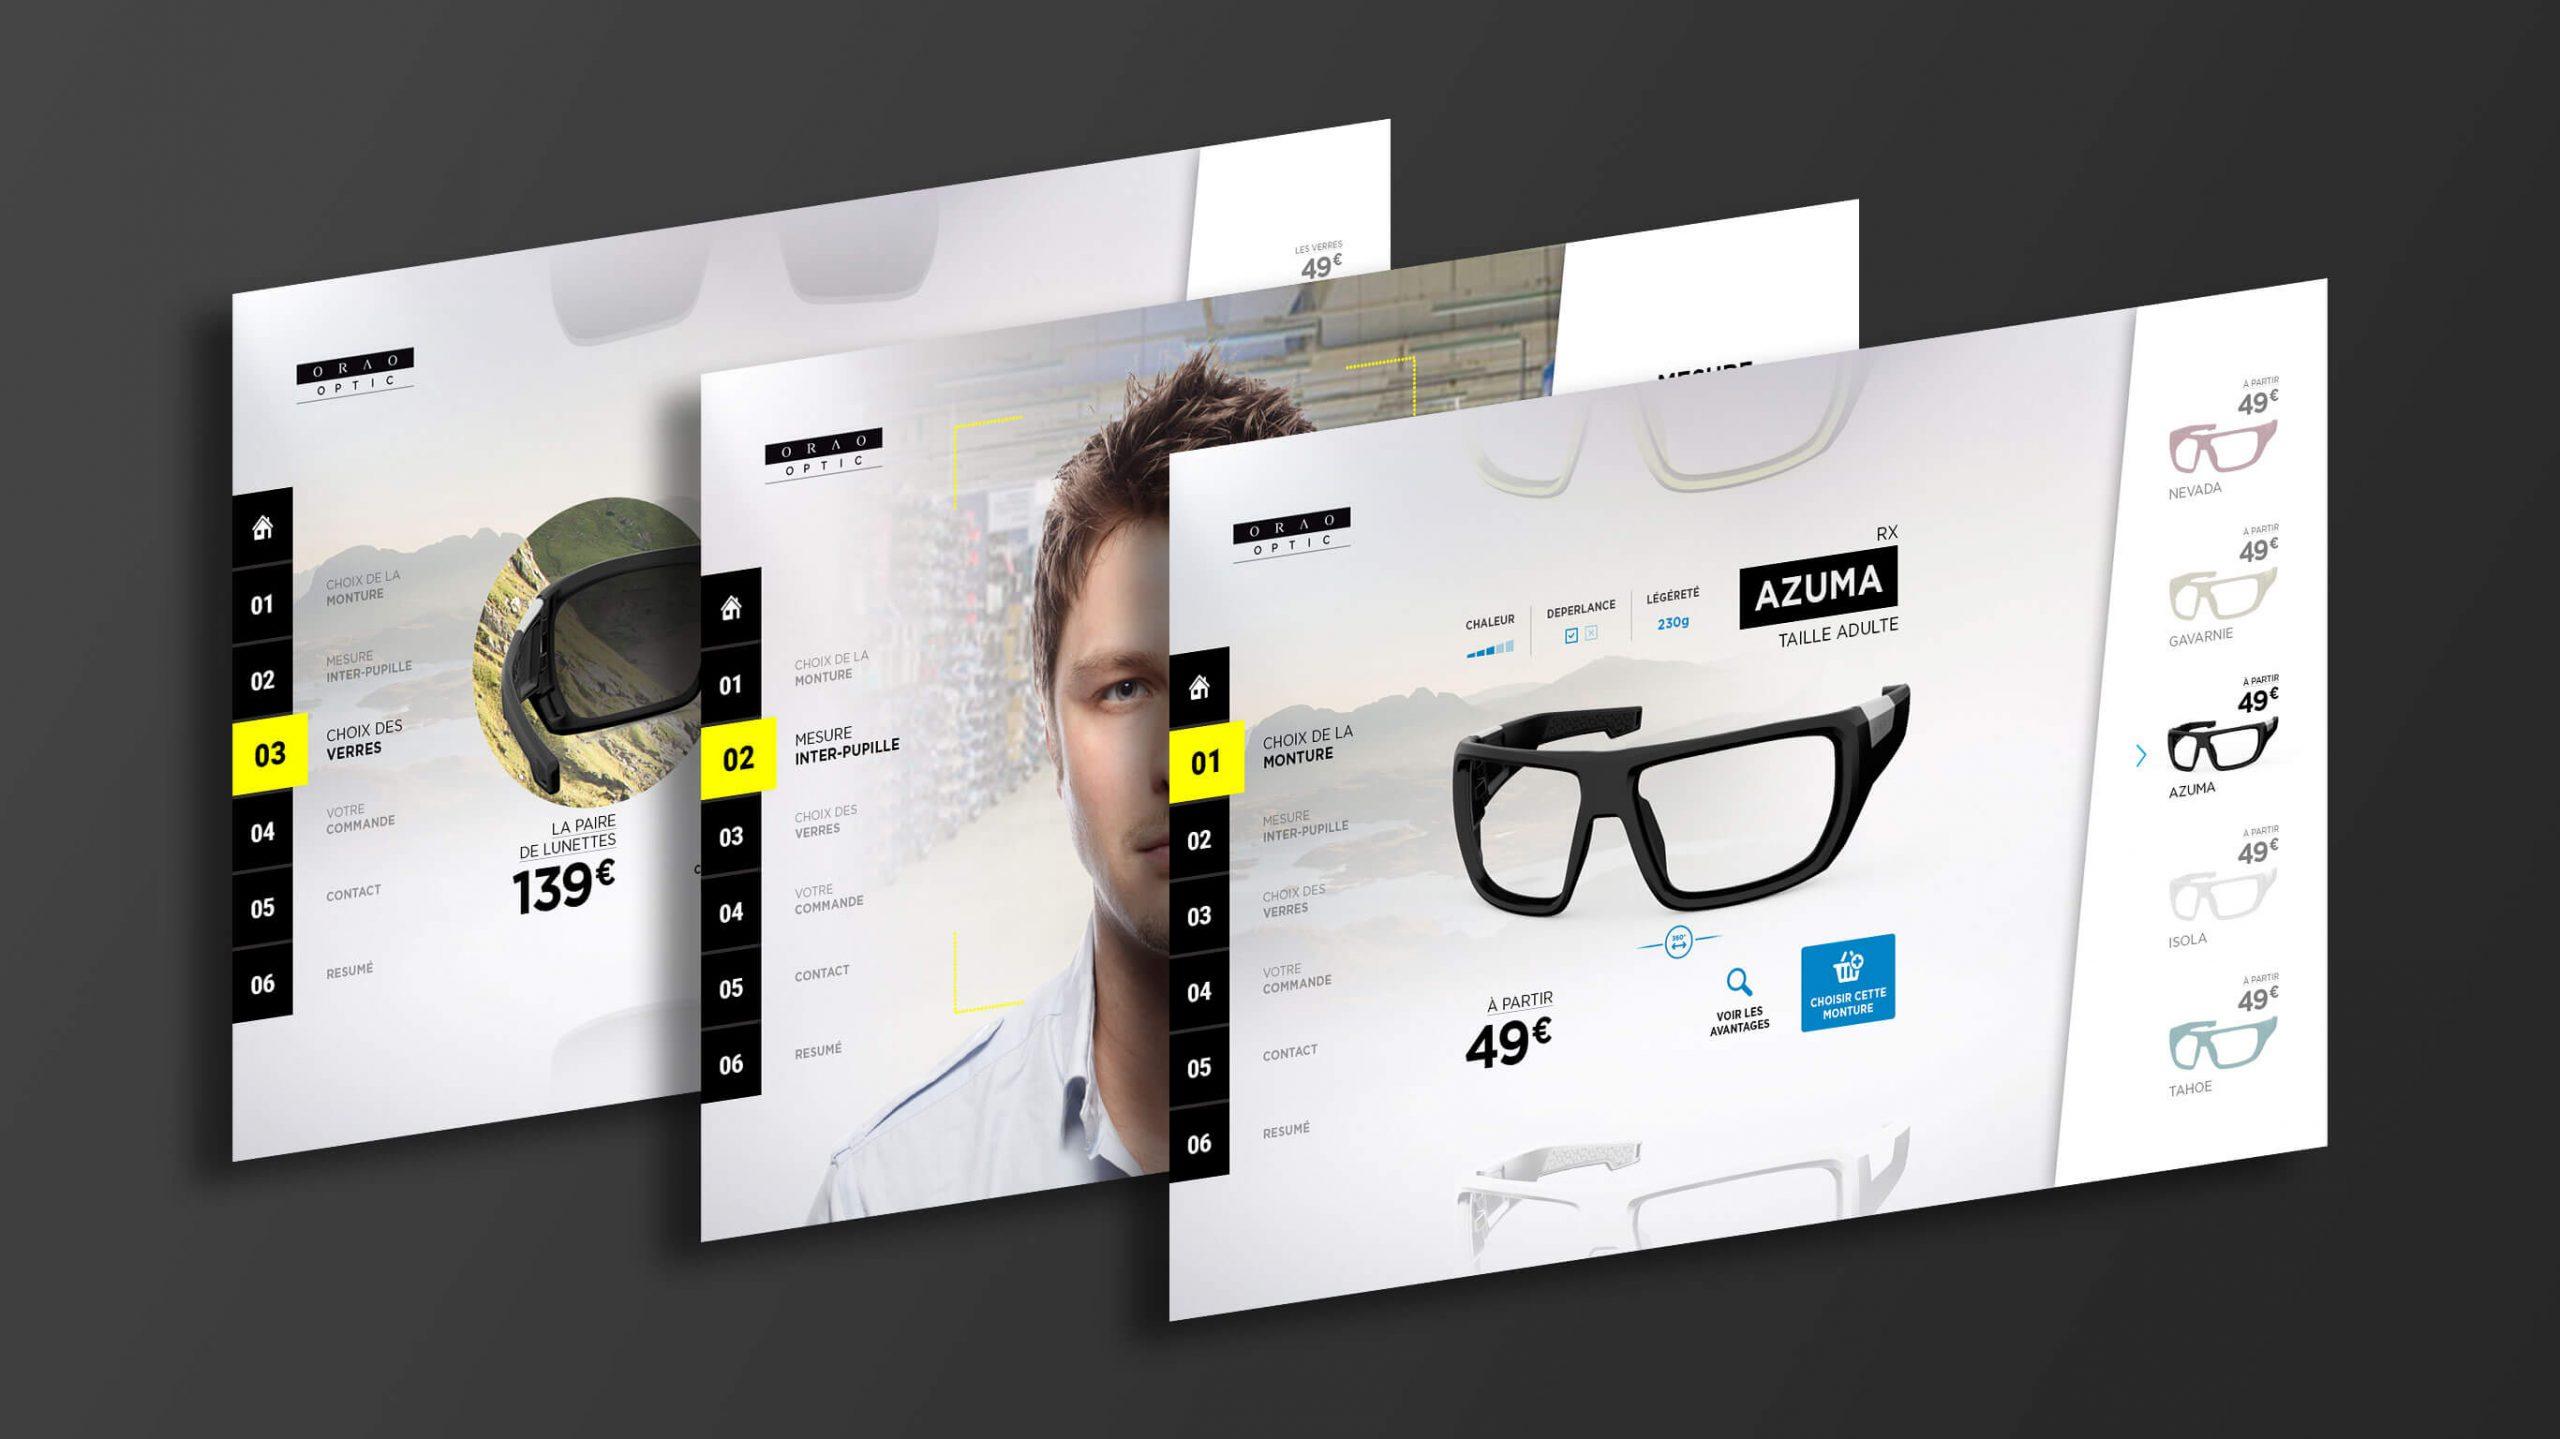 orao-design-application-webdesigner-freelance-02